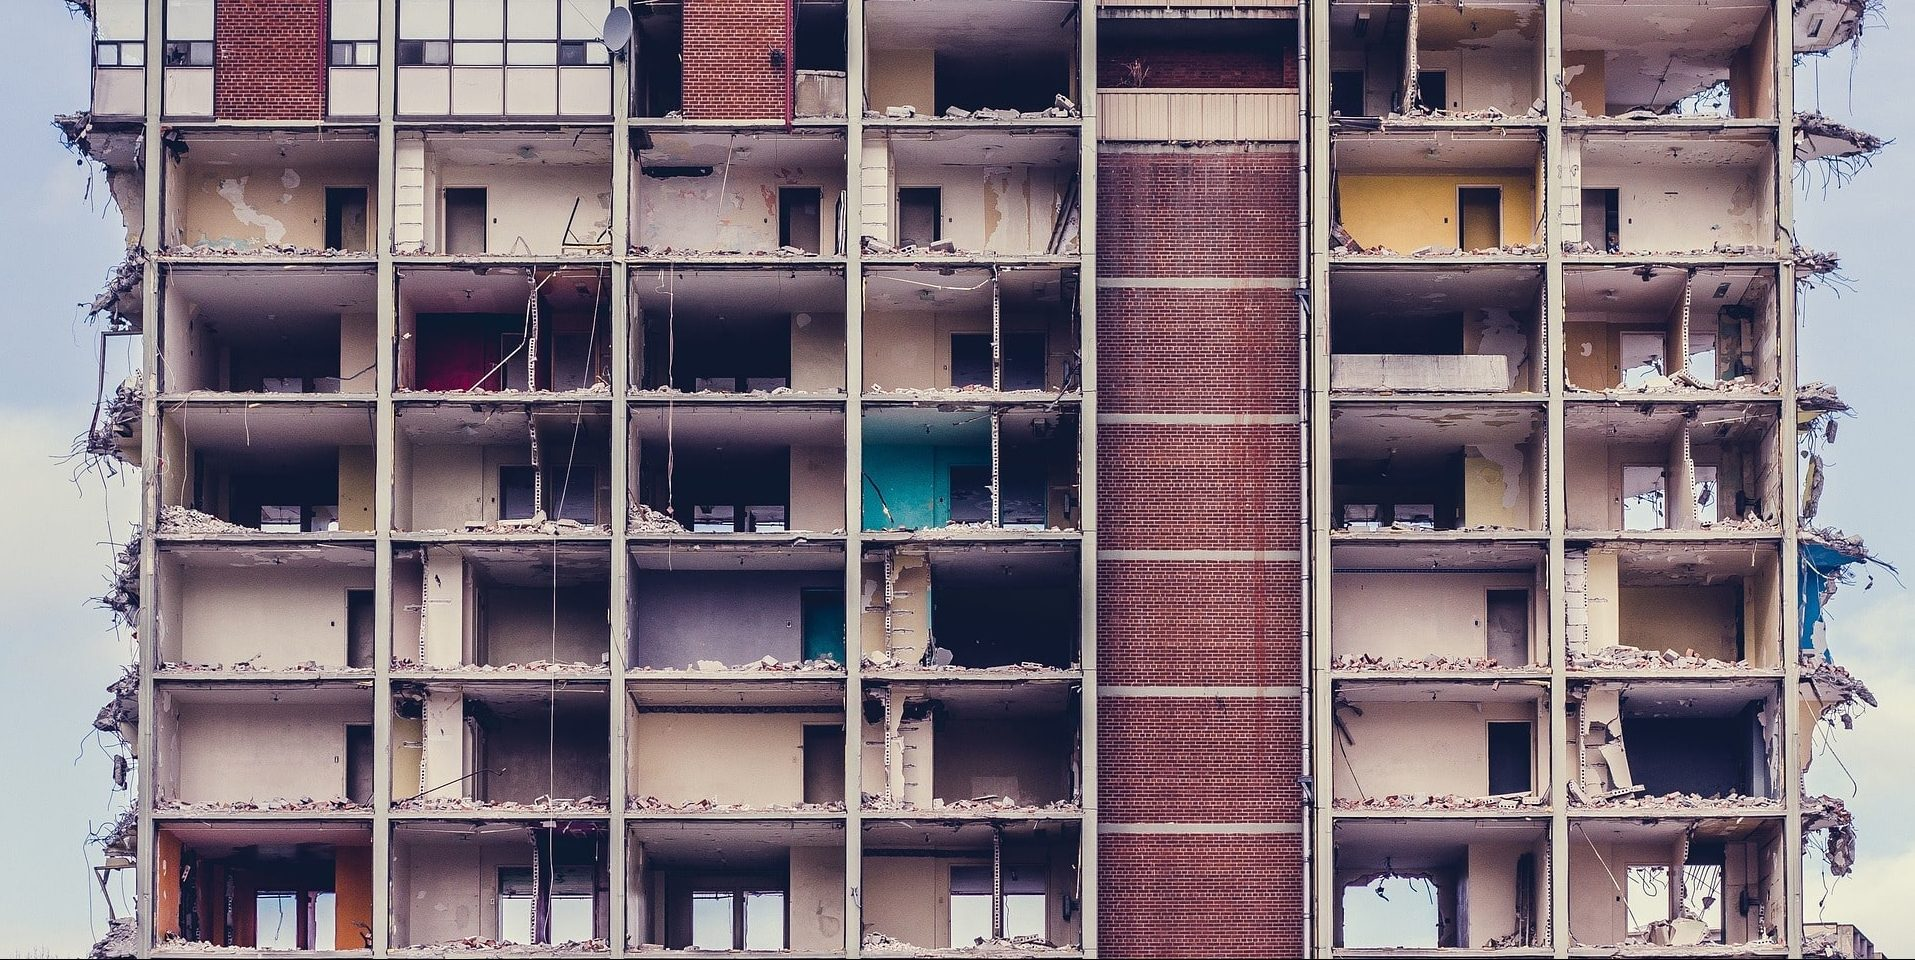 Ugovor o kupoprodaji nepokretnosti nije dovoljan da bi kupci sebe smatrali vlasnikom